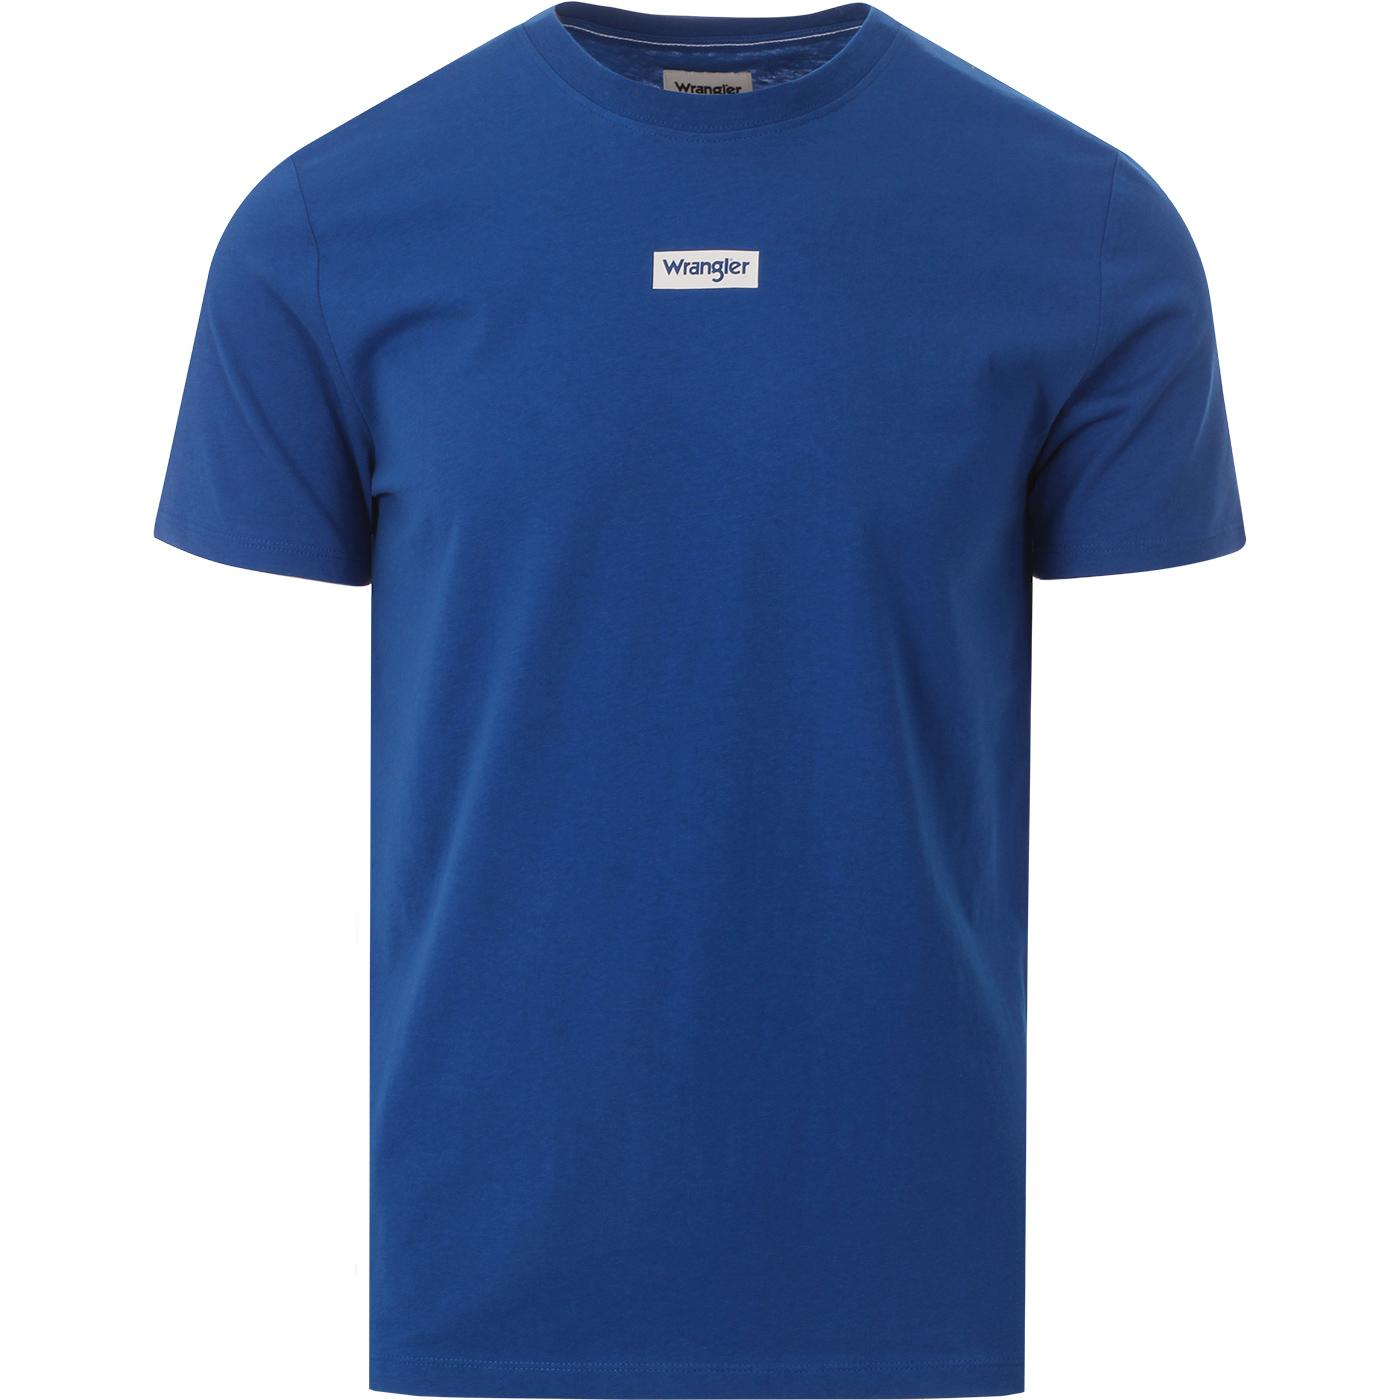 WRANGLER Men's Retro Logo Crew Neck T-shirt (Blue)